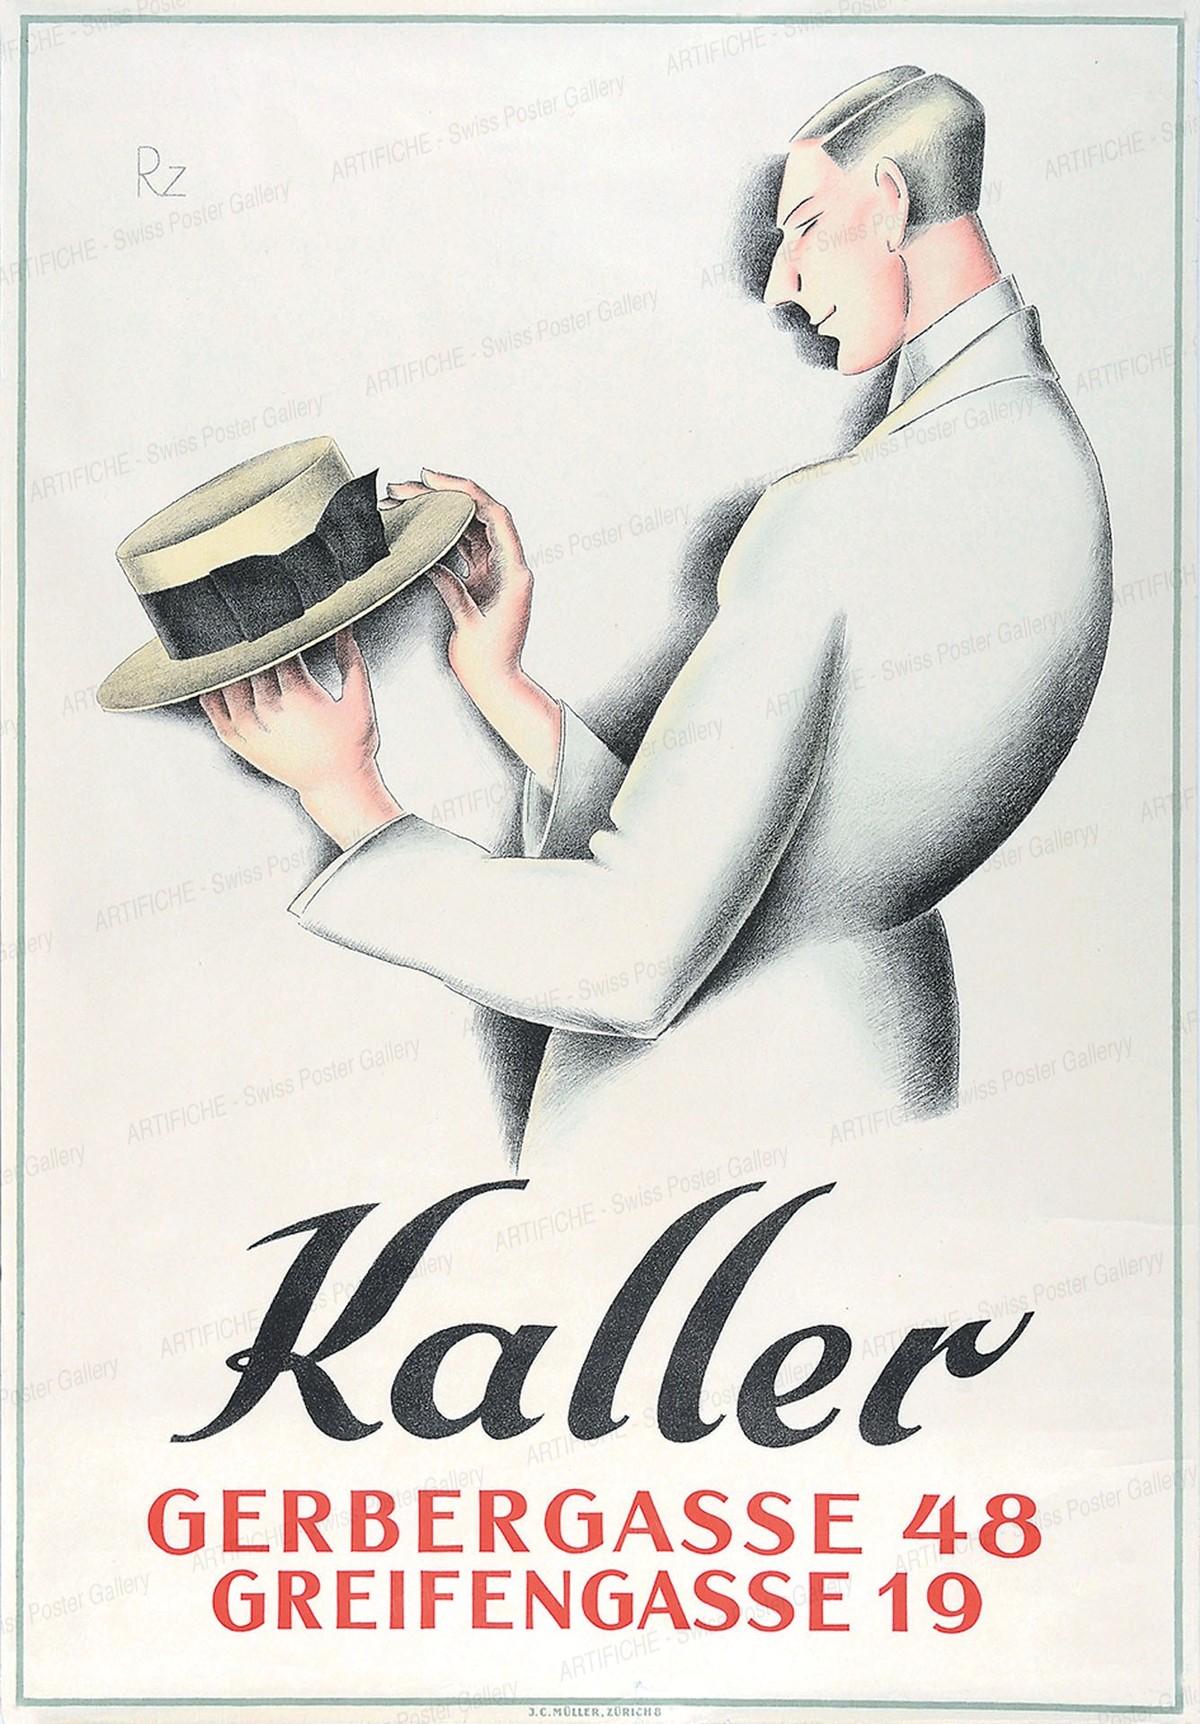 Kaller – Gerbergasse 48 – Greifengasse 19, Ritzmann Jakob